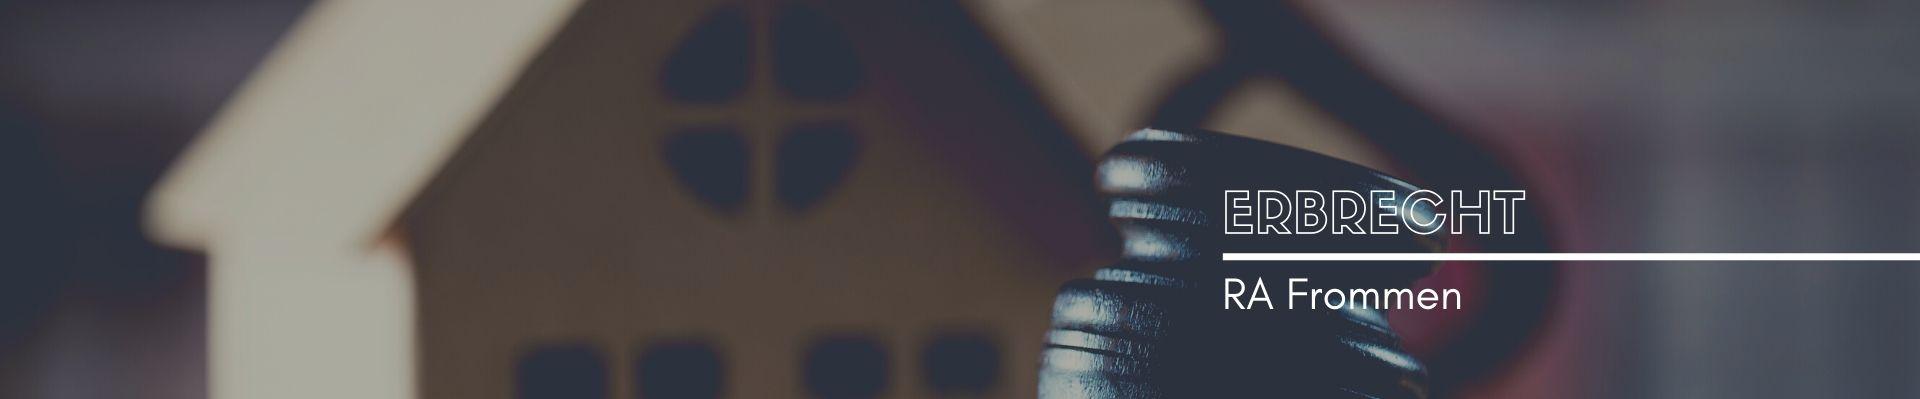 Erbrecht - Rechtsanwälte Geerkens-Frommen-Krause